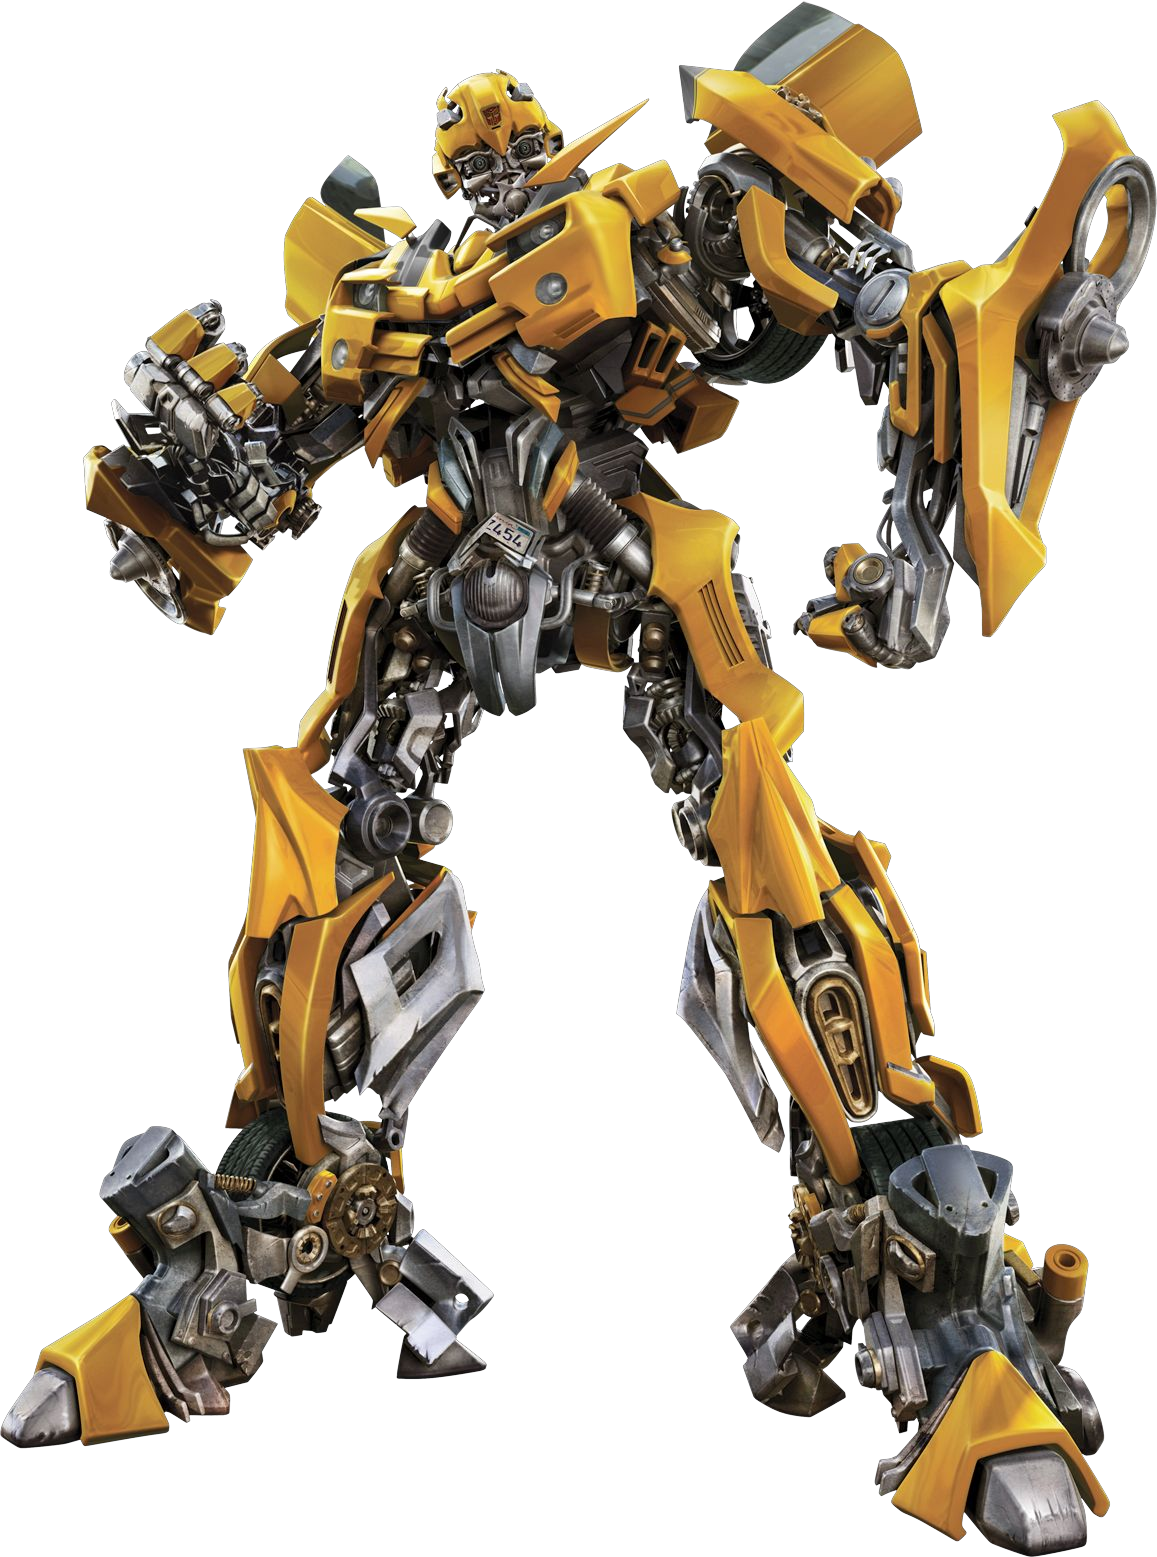 WAYLANDER: DMK Bumblebee WIP 1